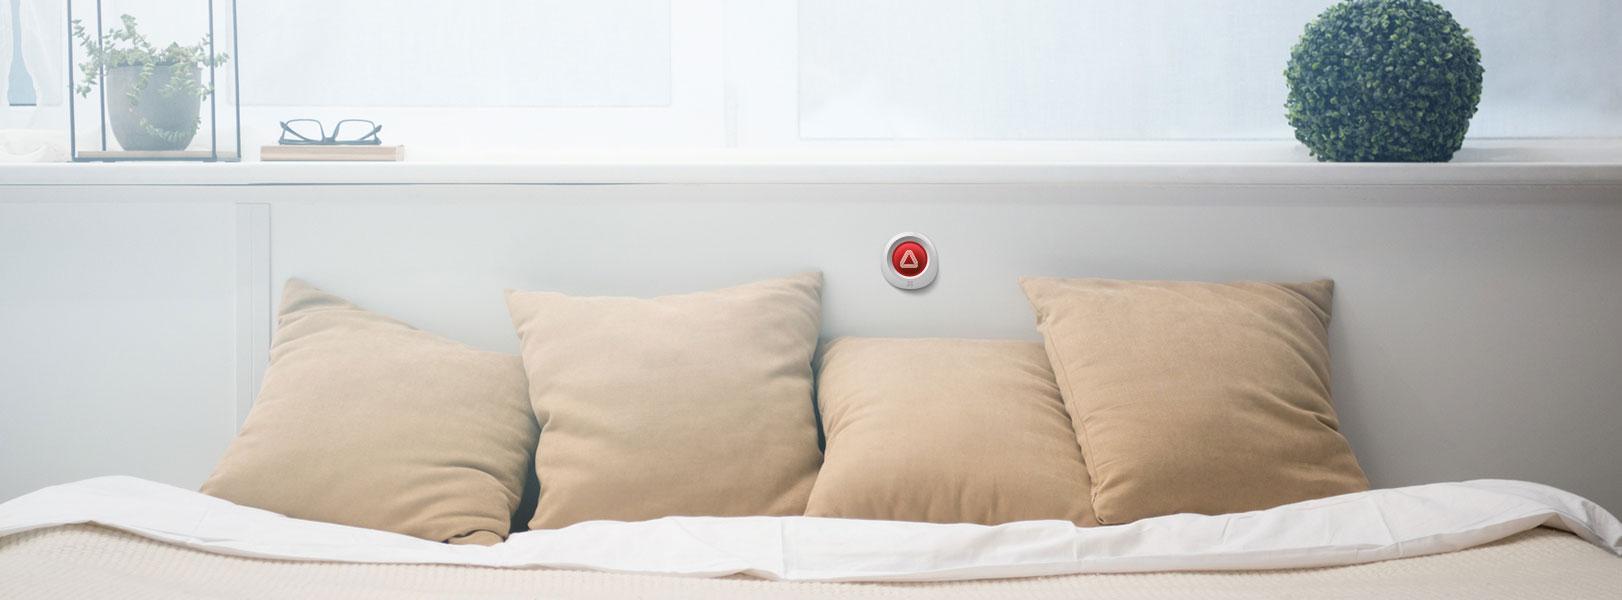 EZVIZ T3 Wire-Free Emergency Button | EZVIZ